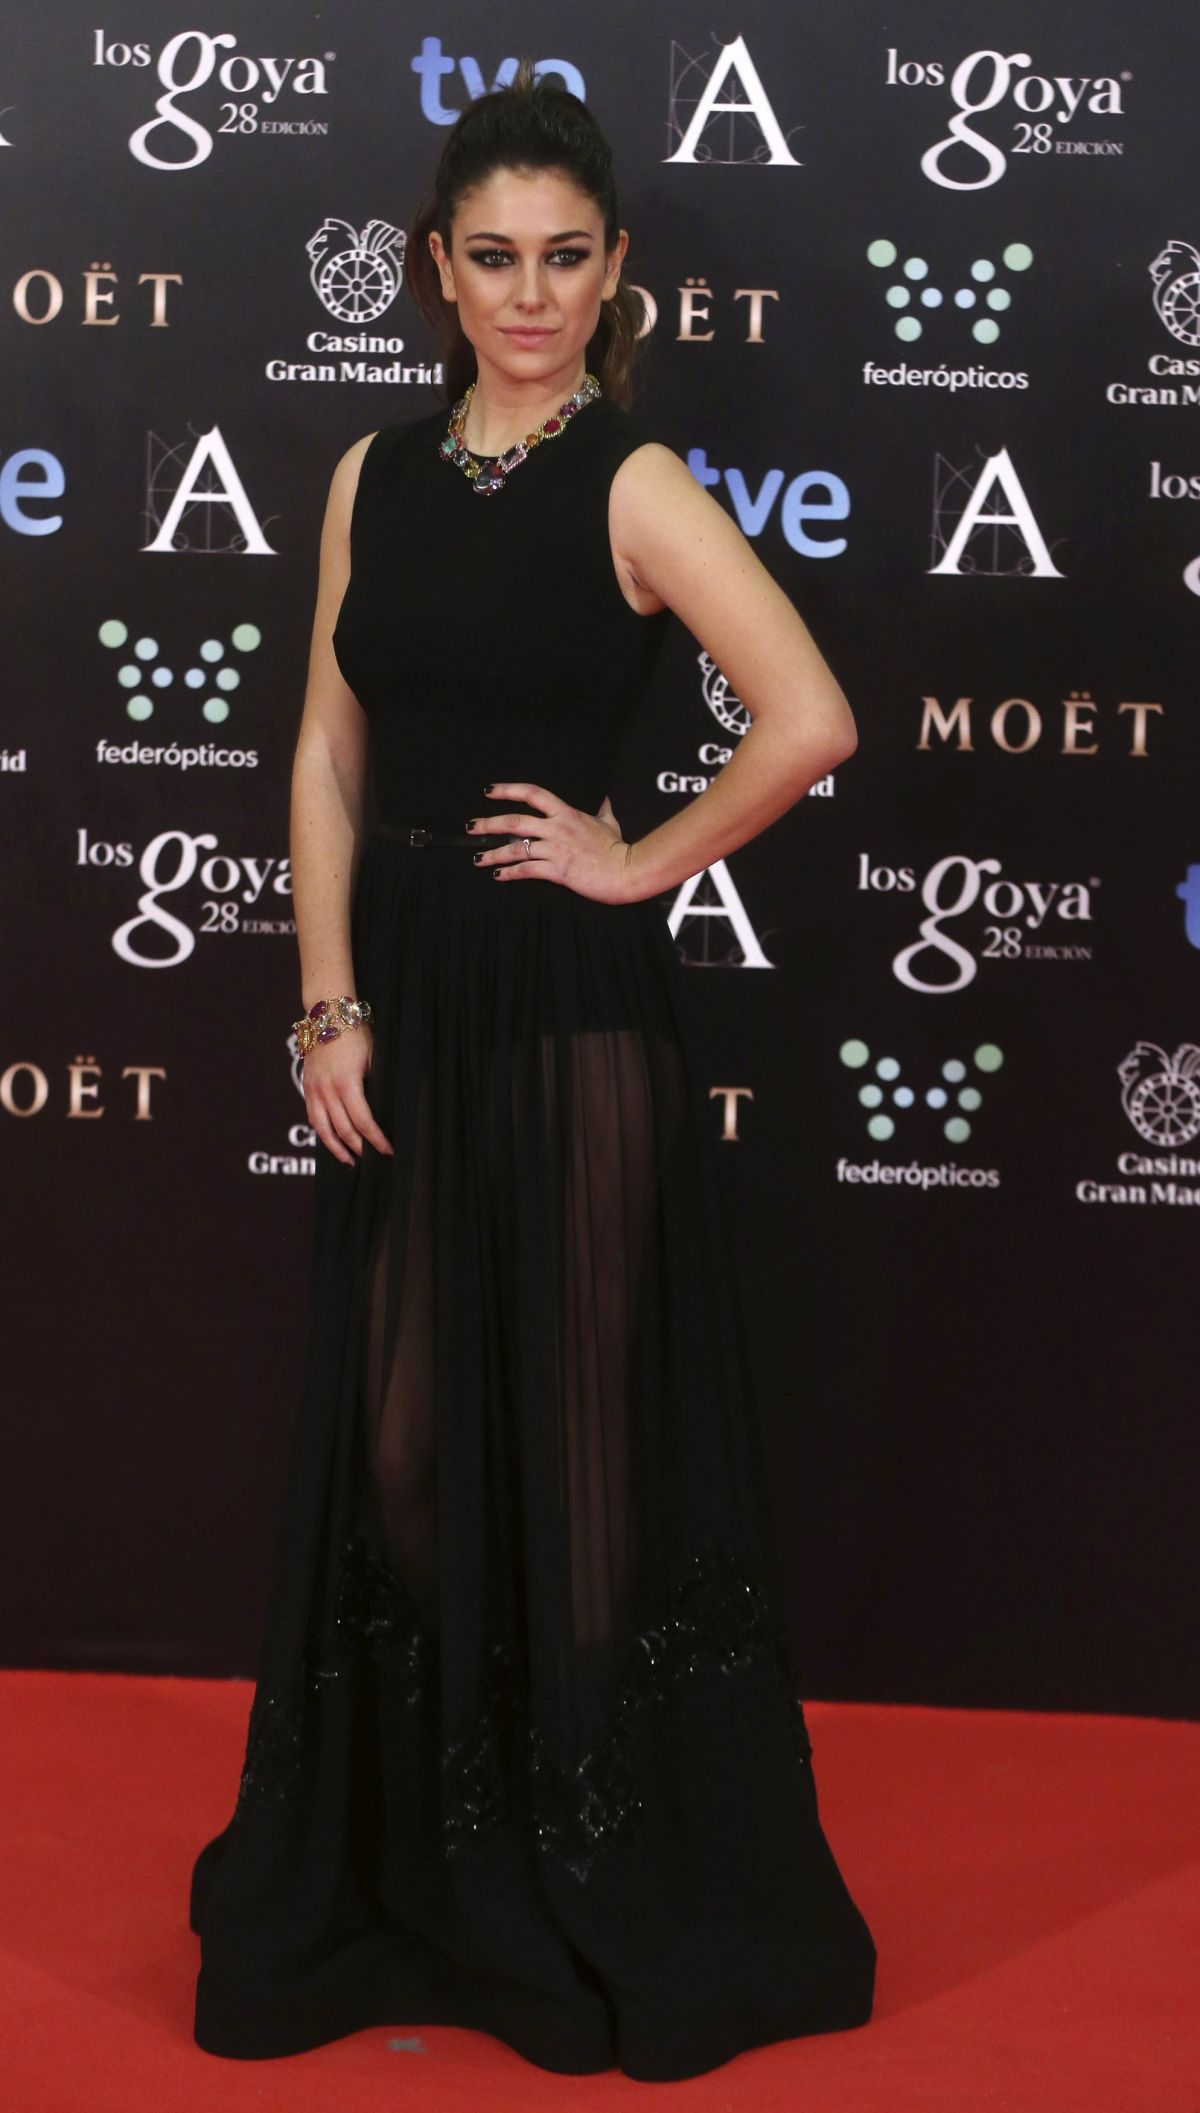 BLANCA SUAREZ at 2014 Goya Film Awards in Madrid